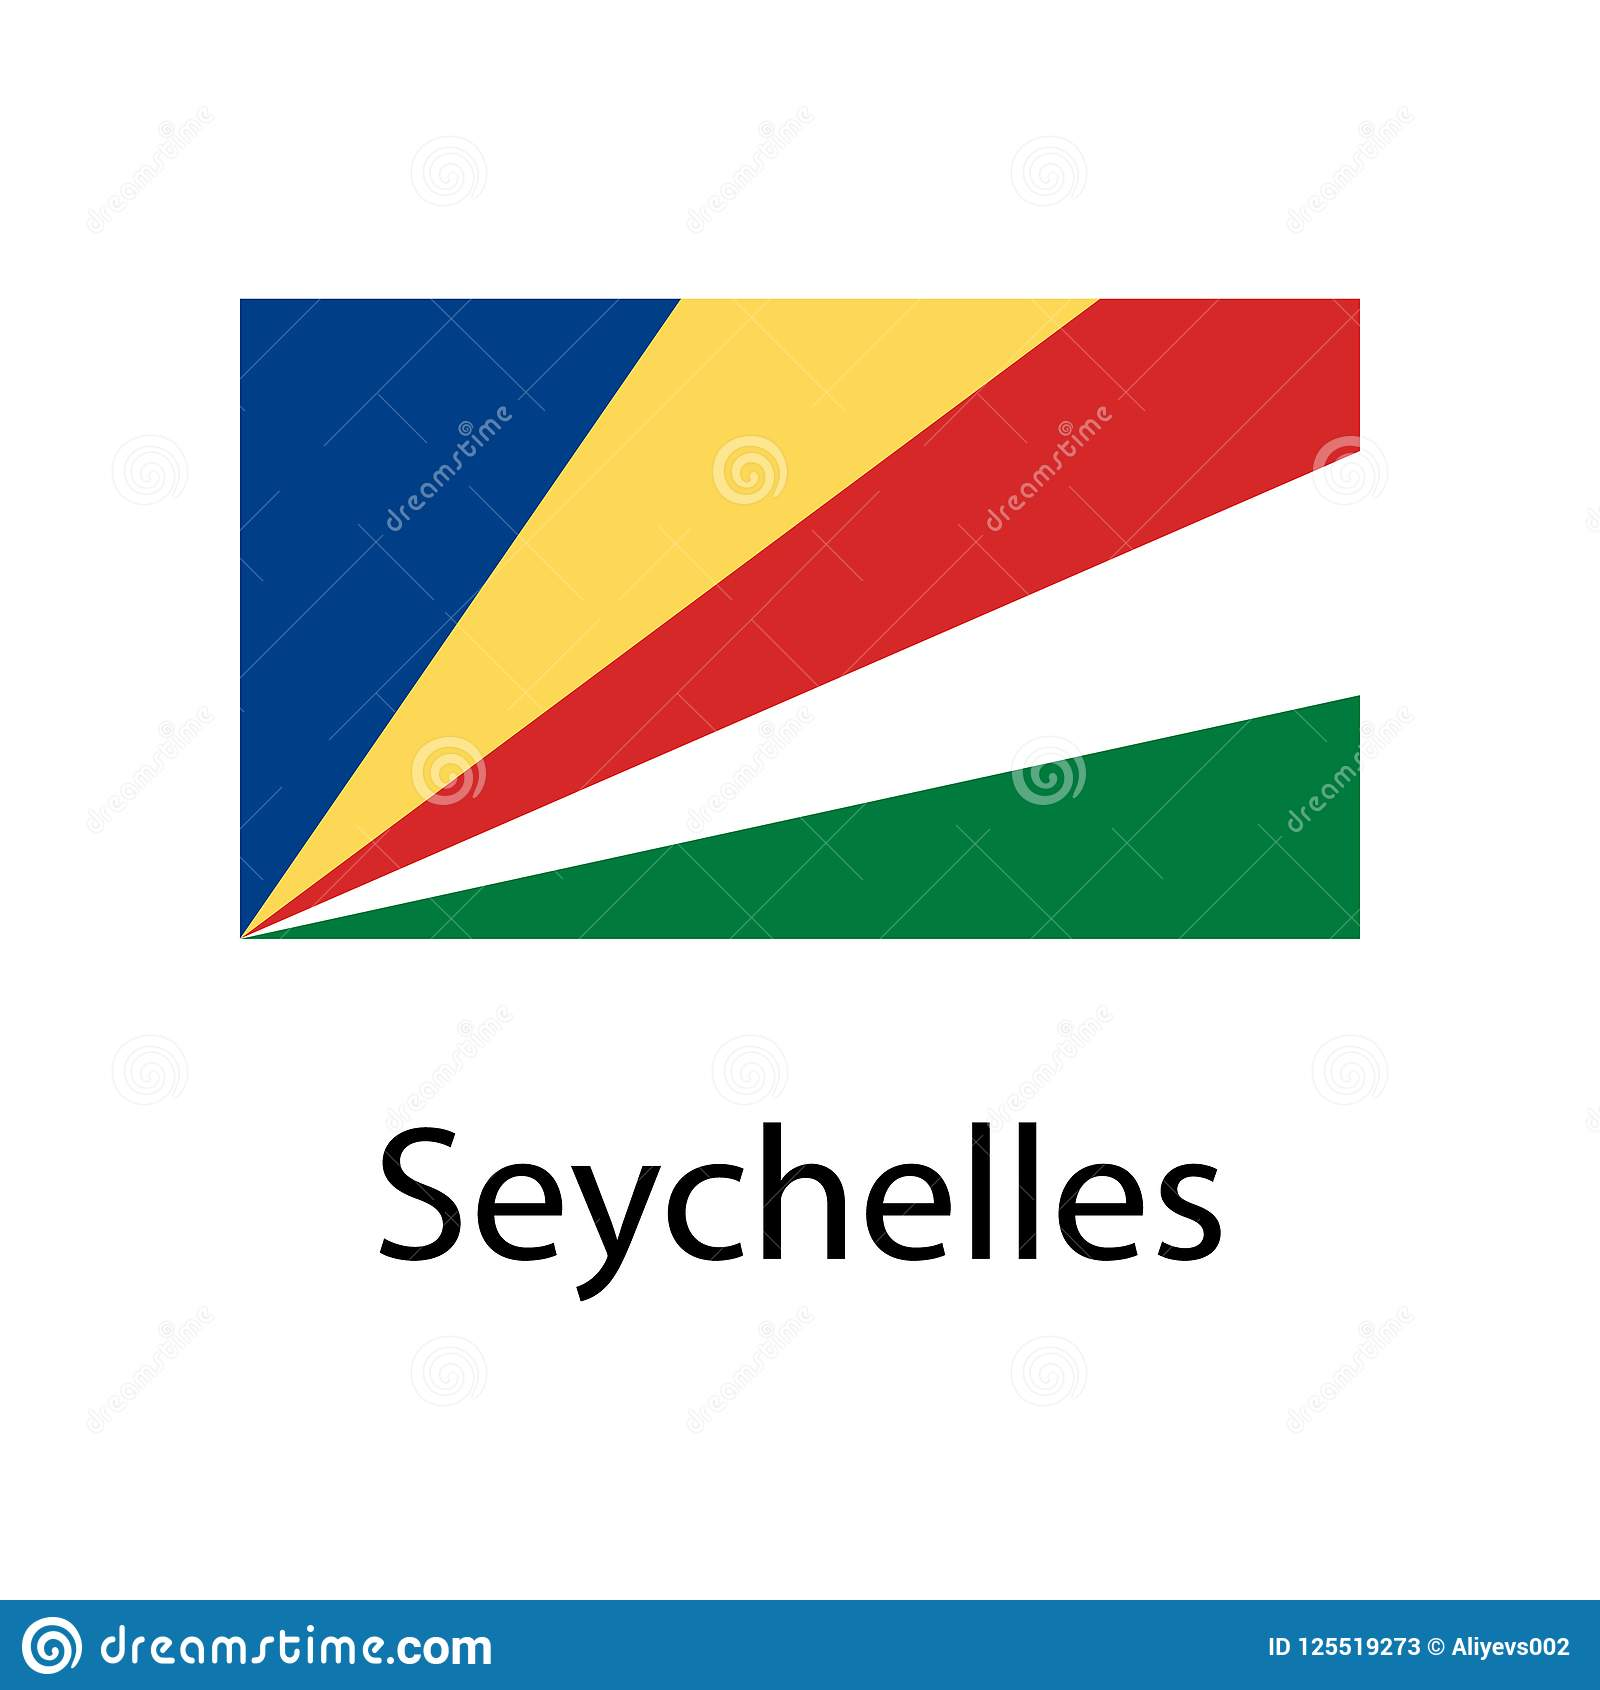 Image result for seychelles name